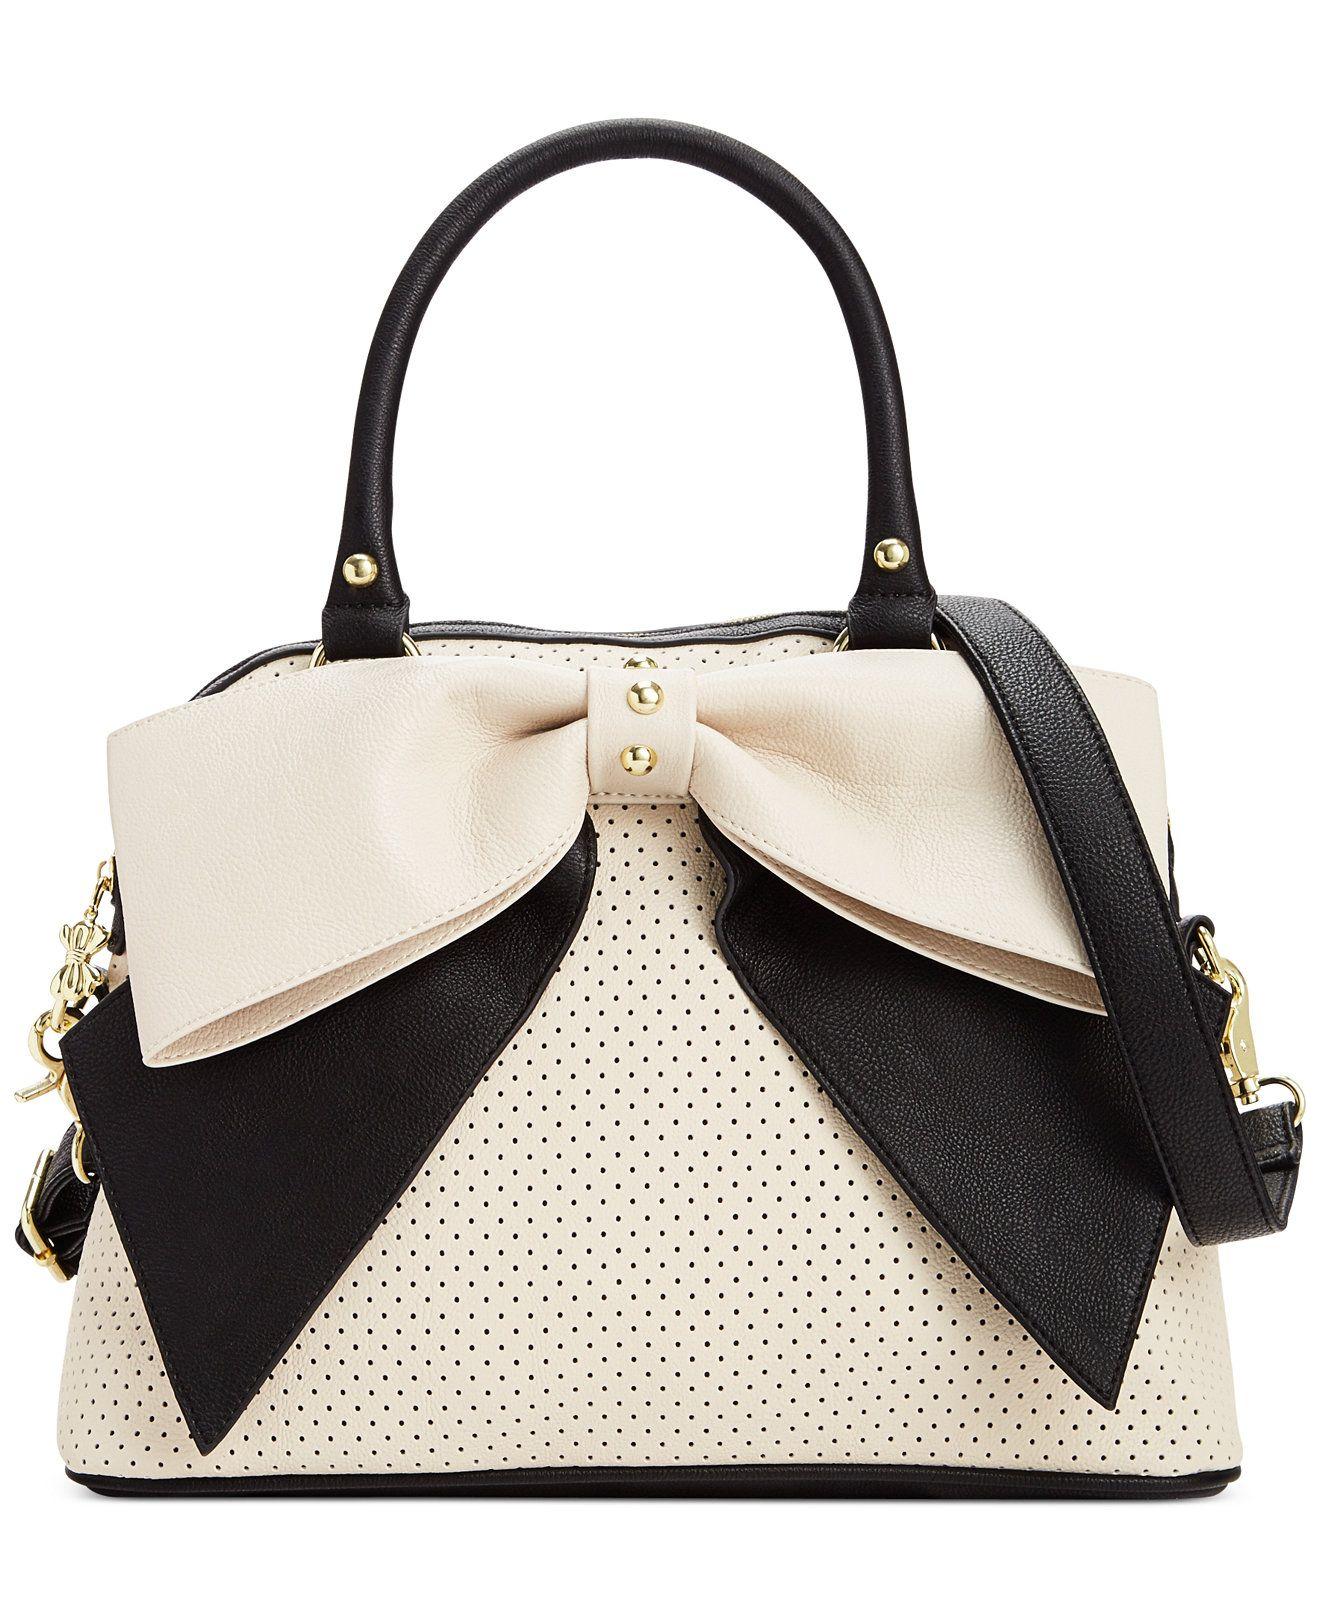 e1580f57c1 Betsey Johnson Macy s Exclusive Dome Satchel - Impulse Contemporary Brands  - Handbags   Accessories - Macy s